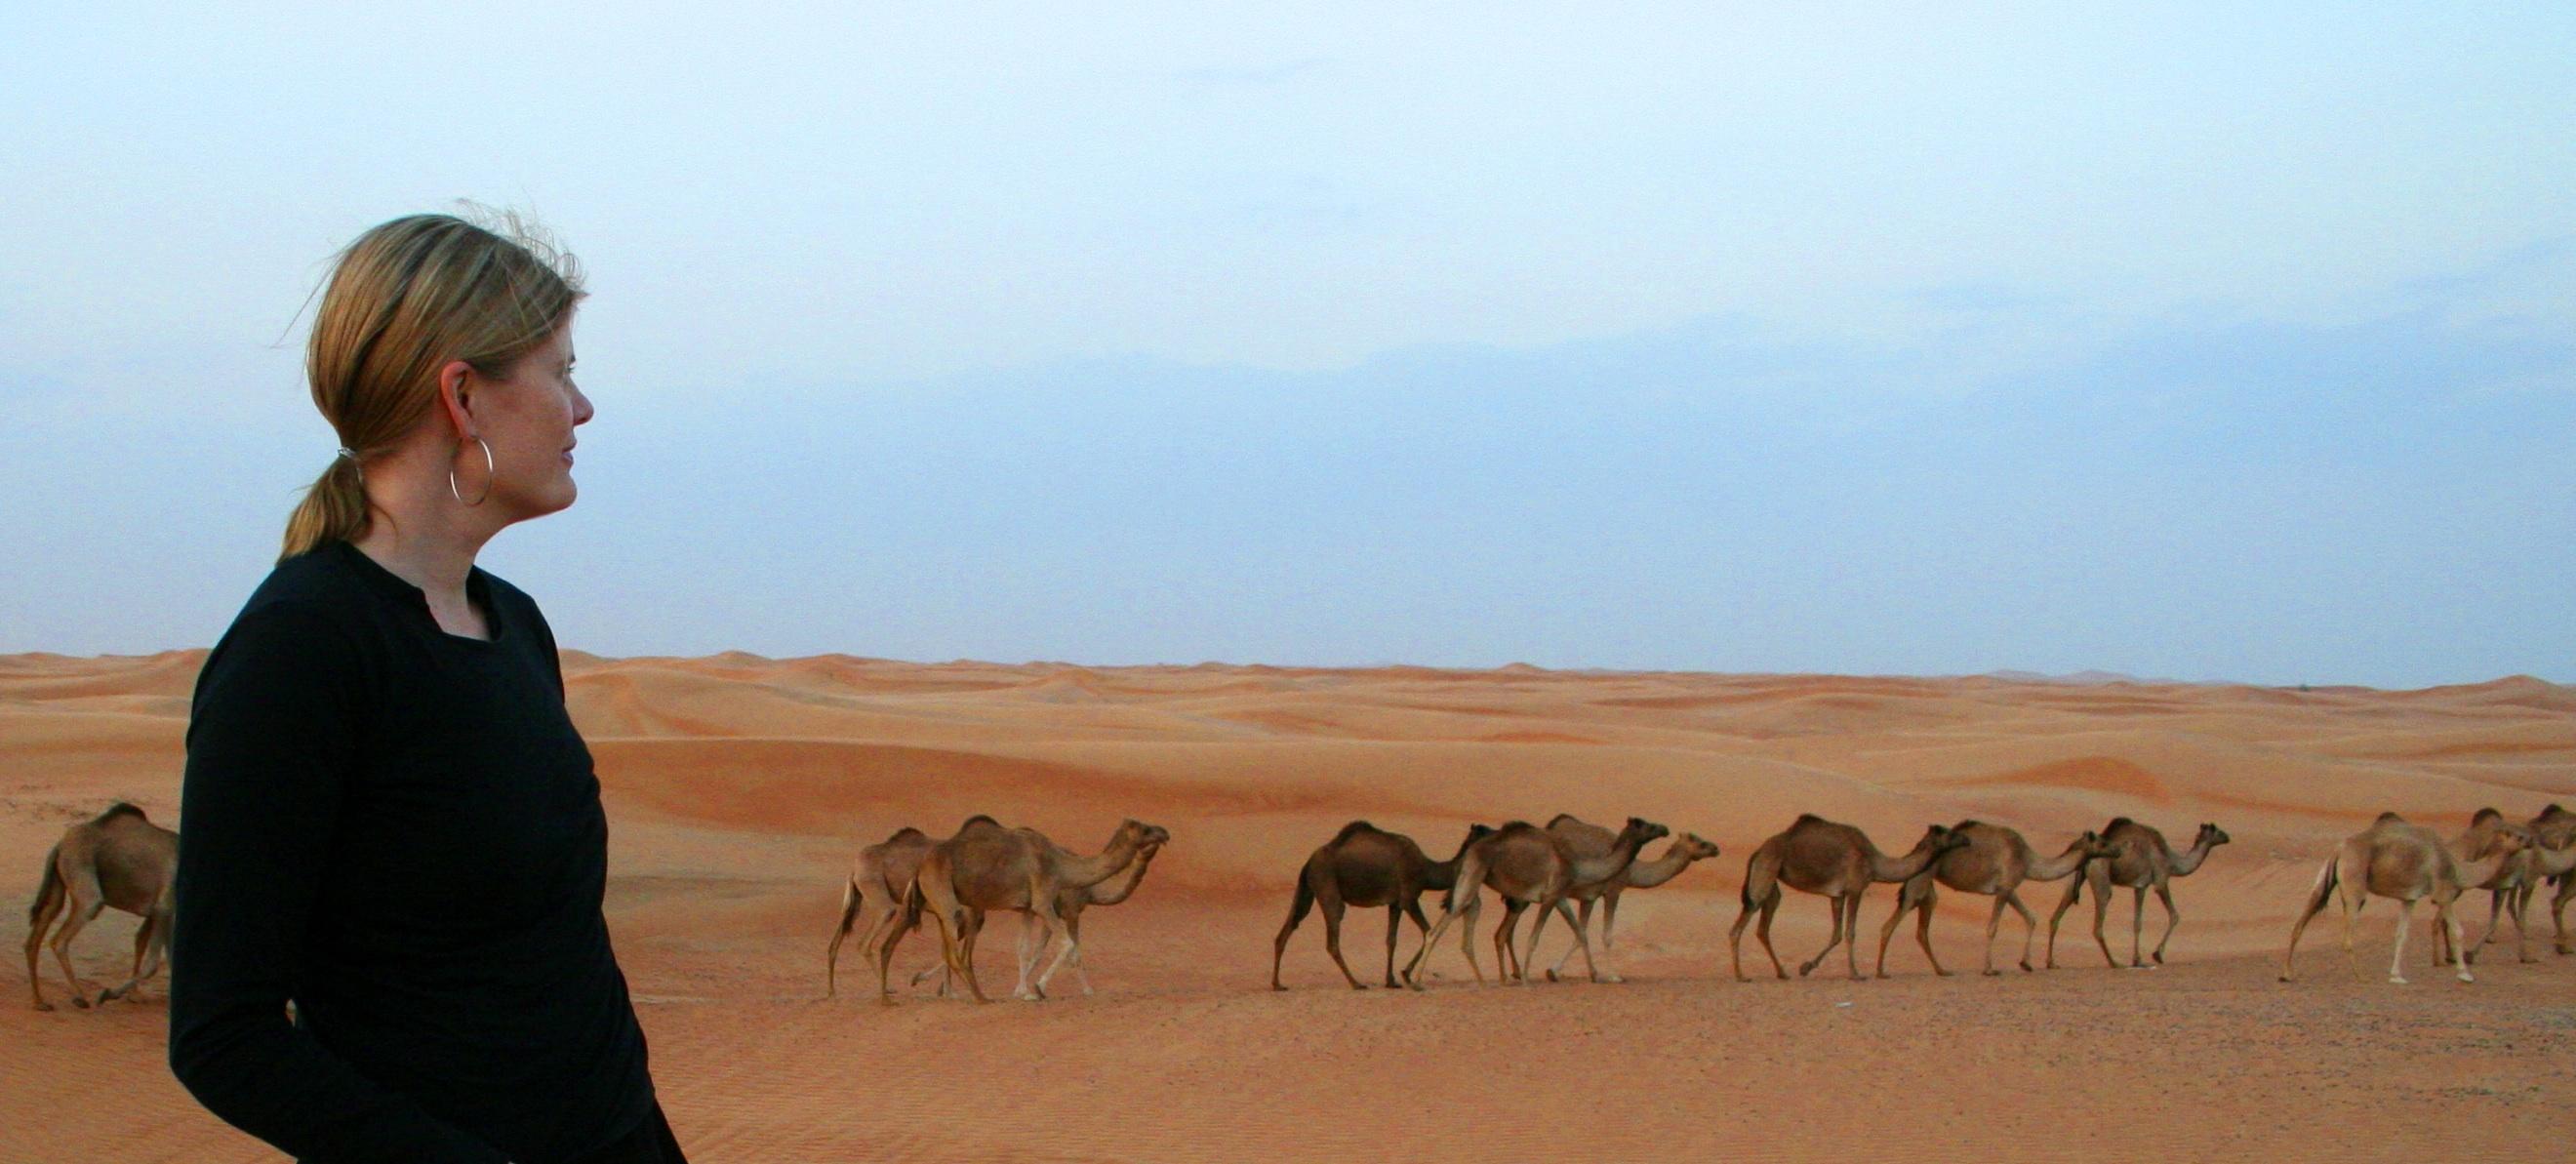 Sharjah, United Arab Emirates, 2009